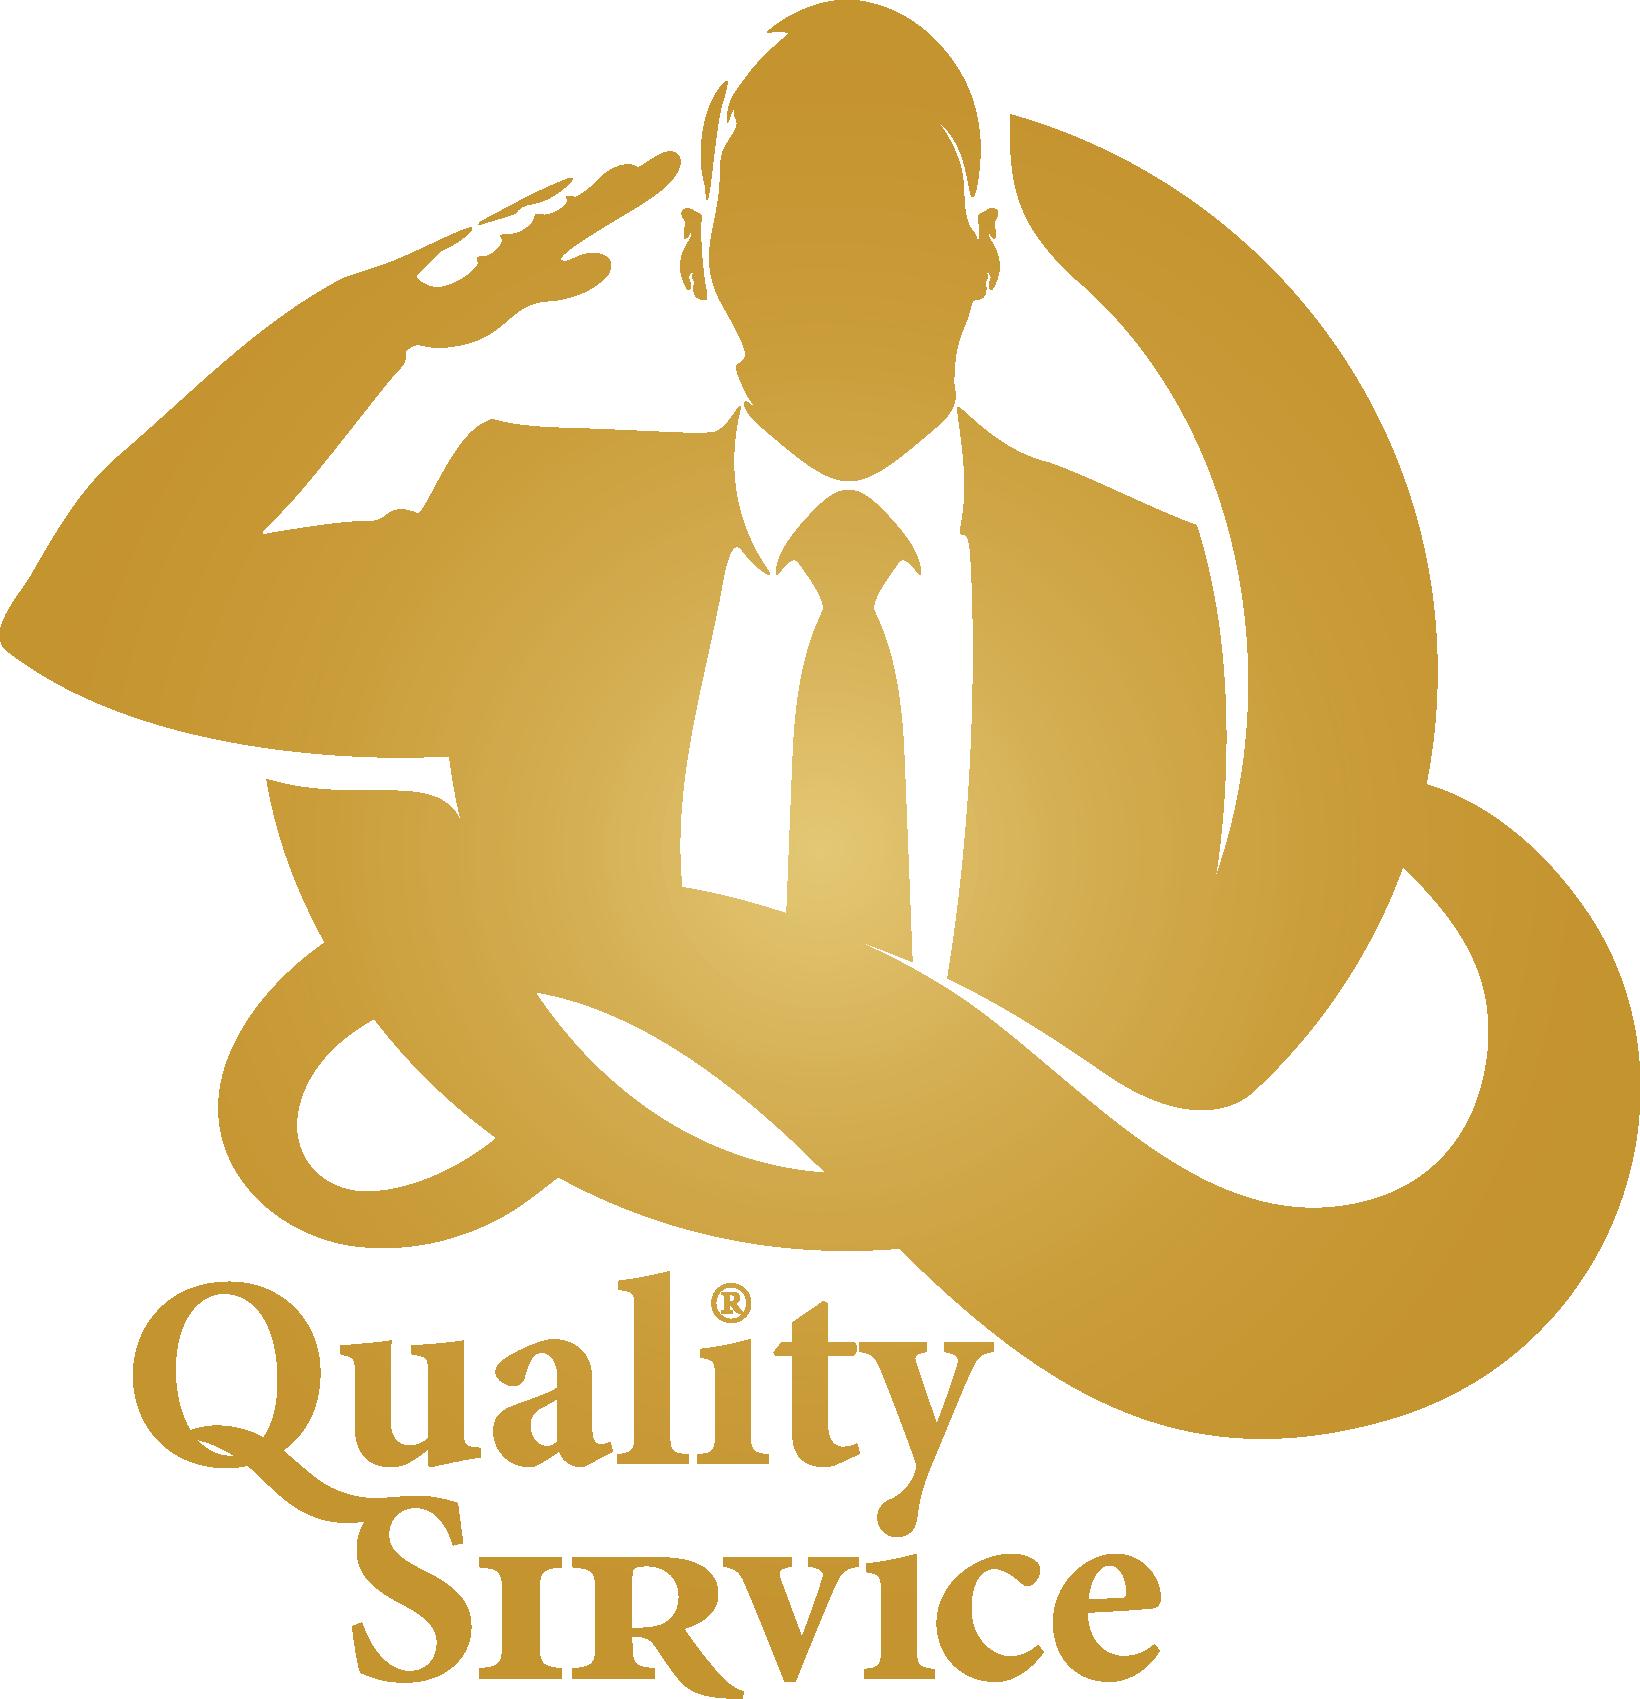 Quality SIRvice